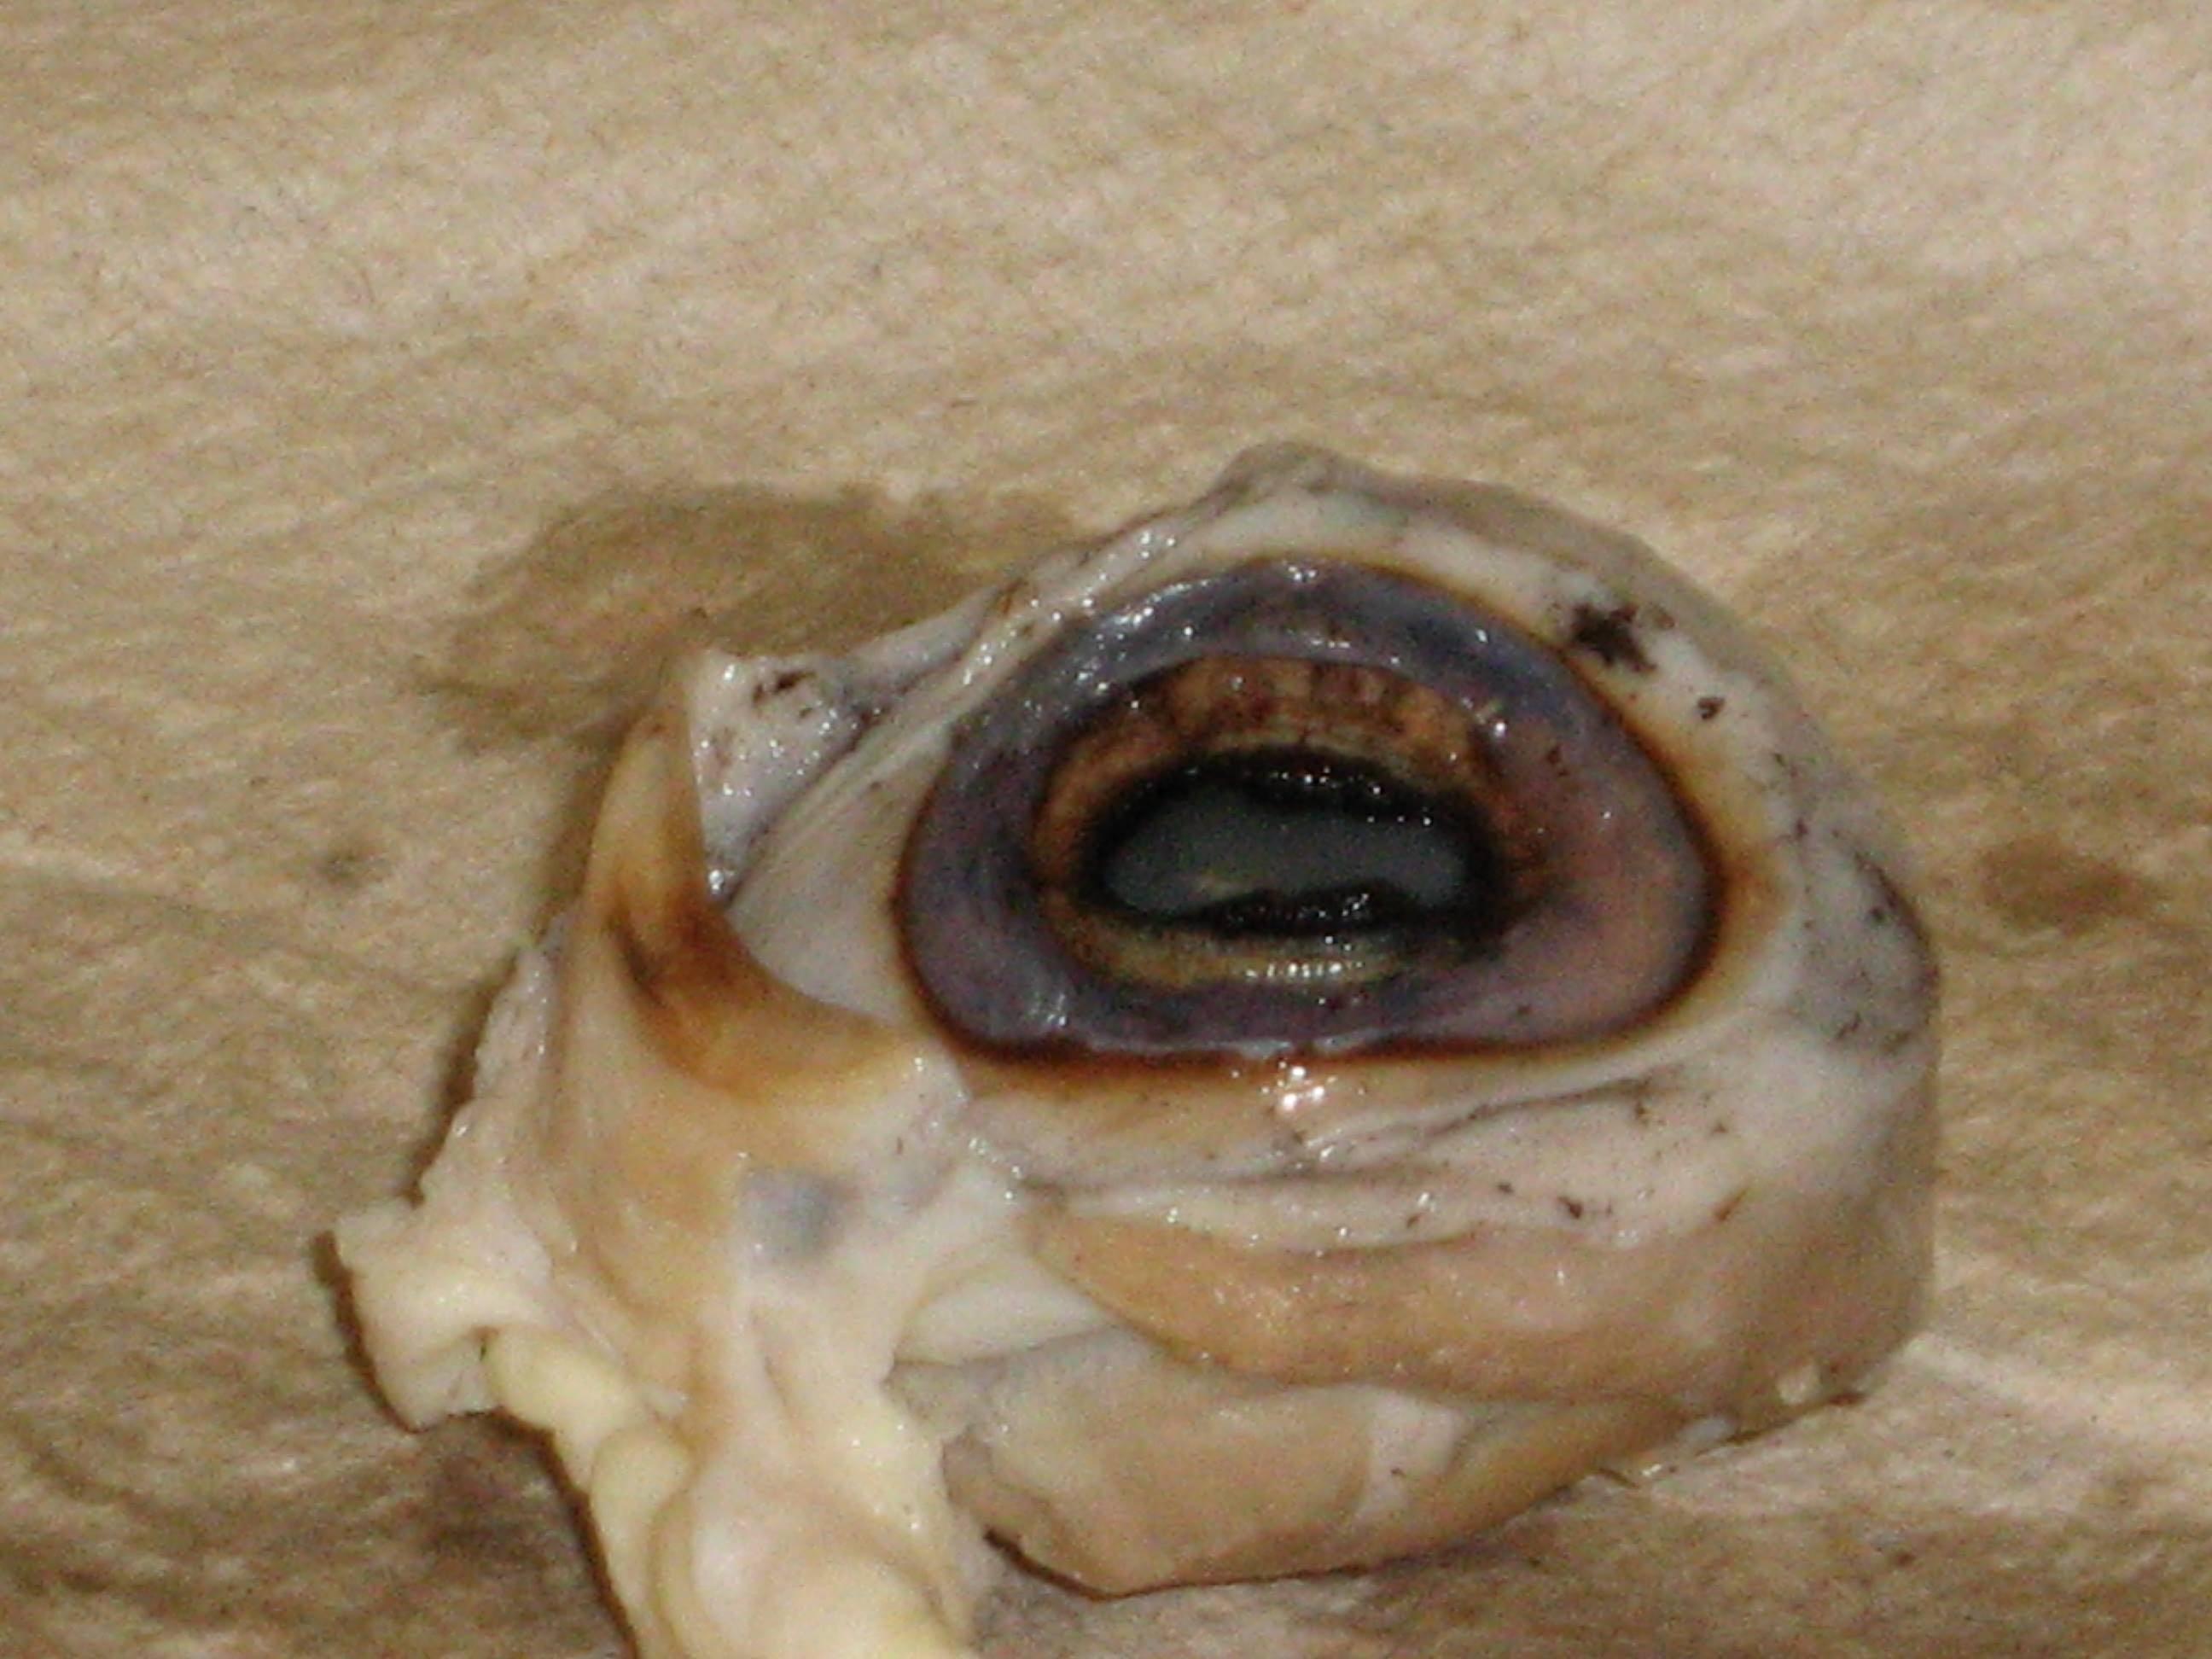 Eyeballdissection